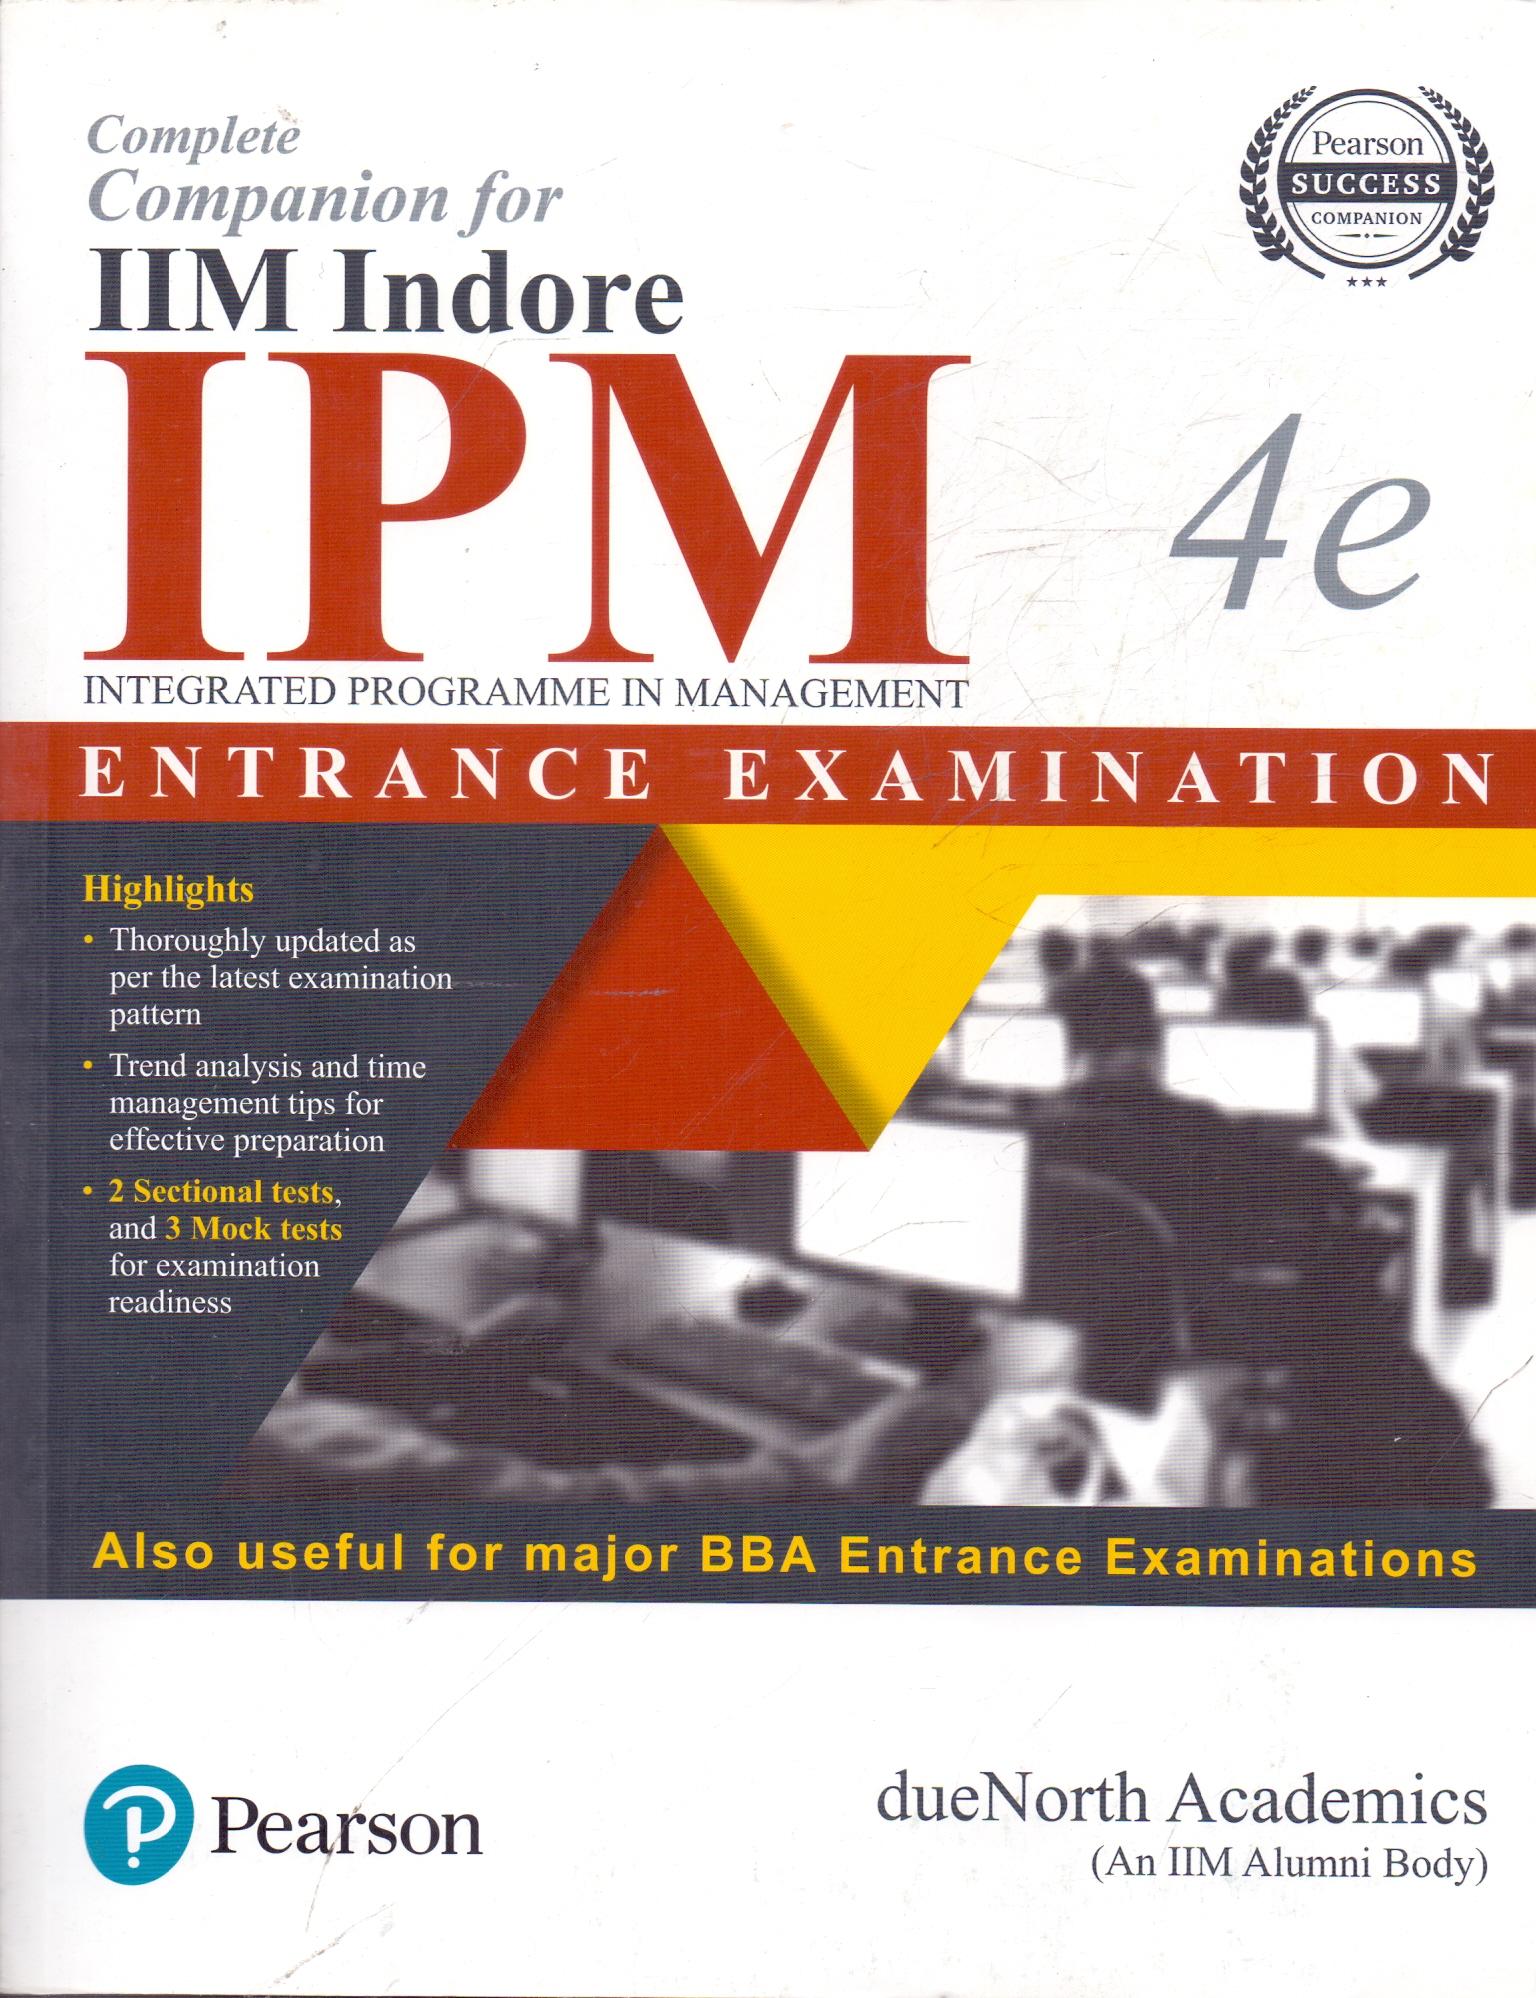 Complete Companion for IIM Indore IPM